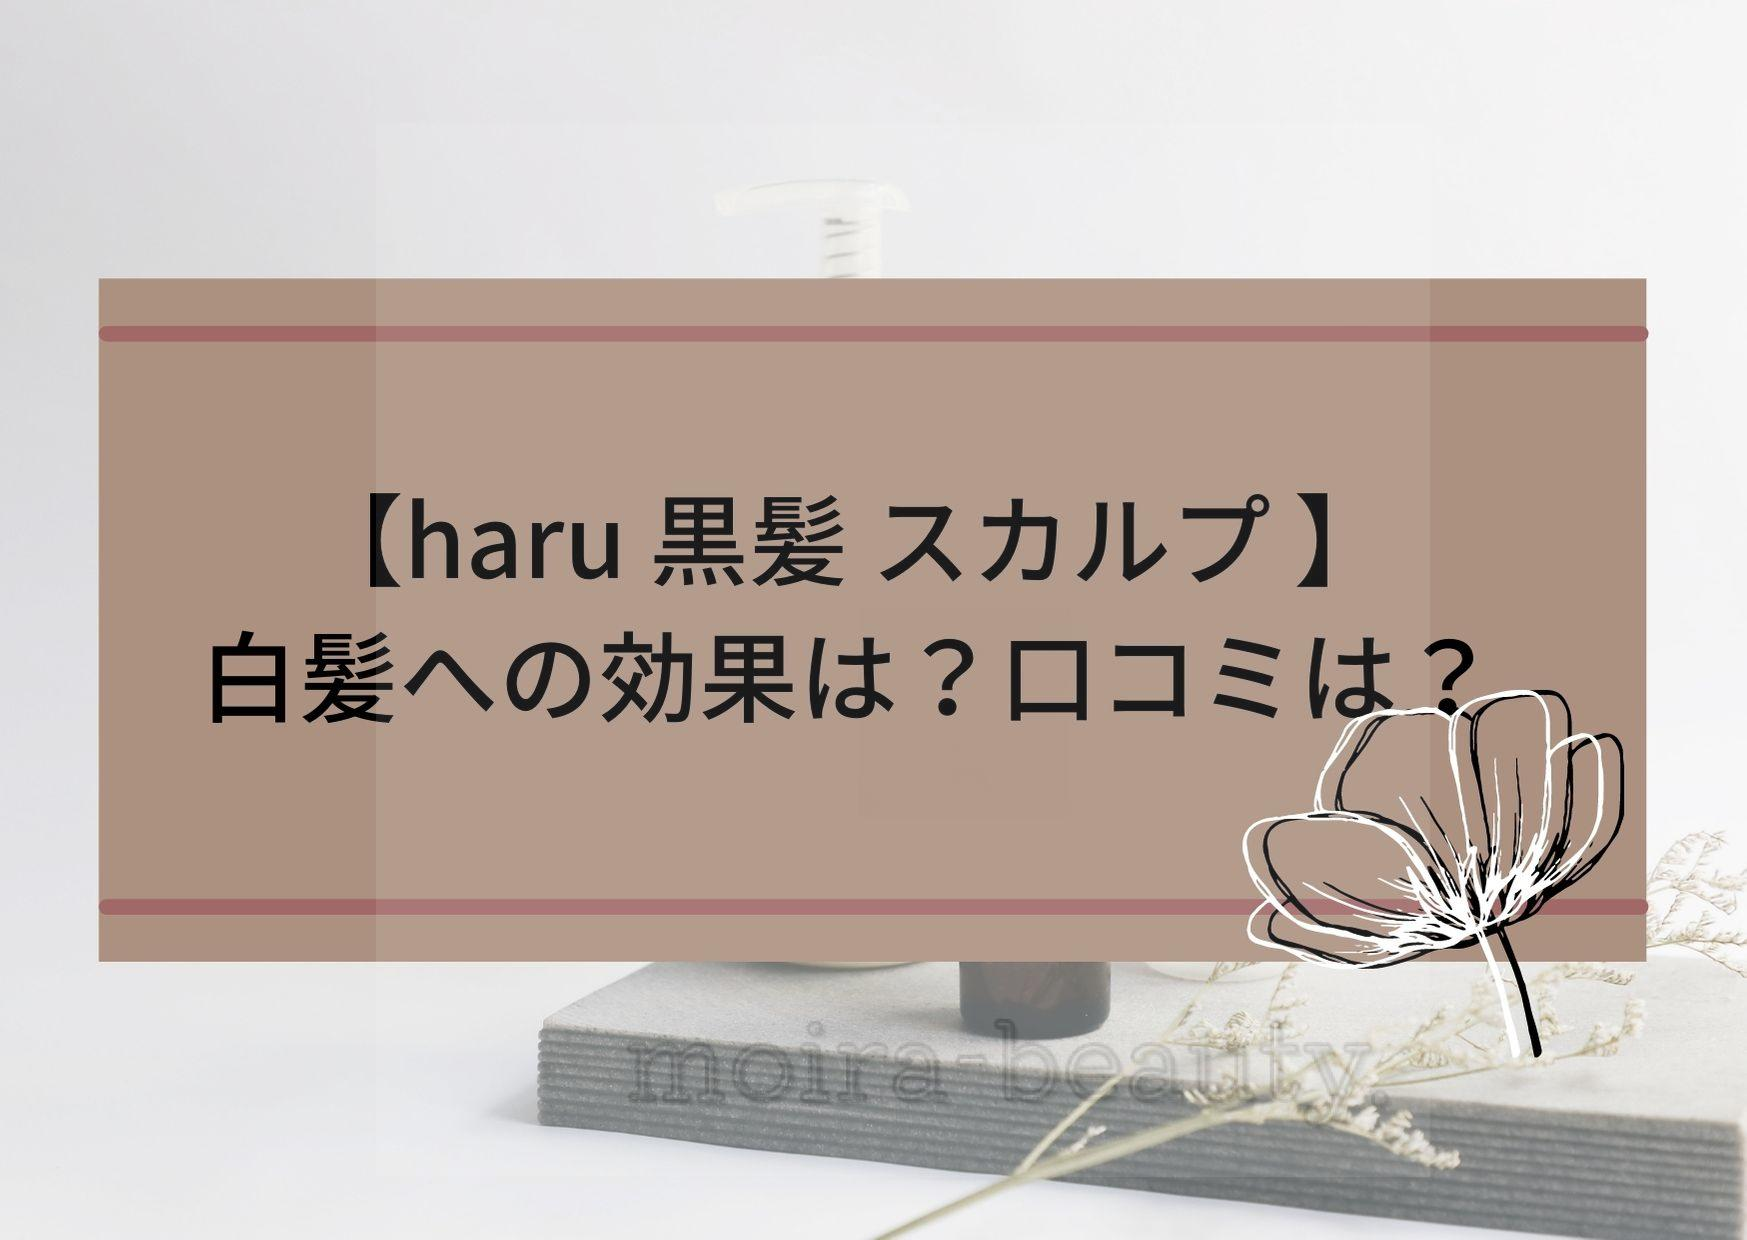 haru黒髪スカルプの白髪への効果は?口コミは?